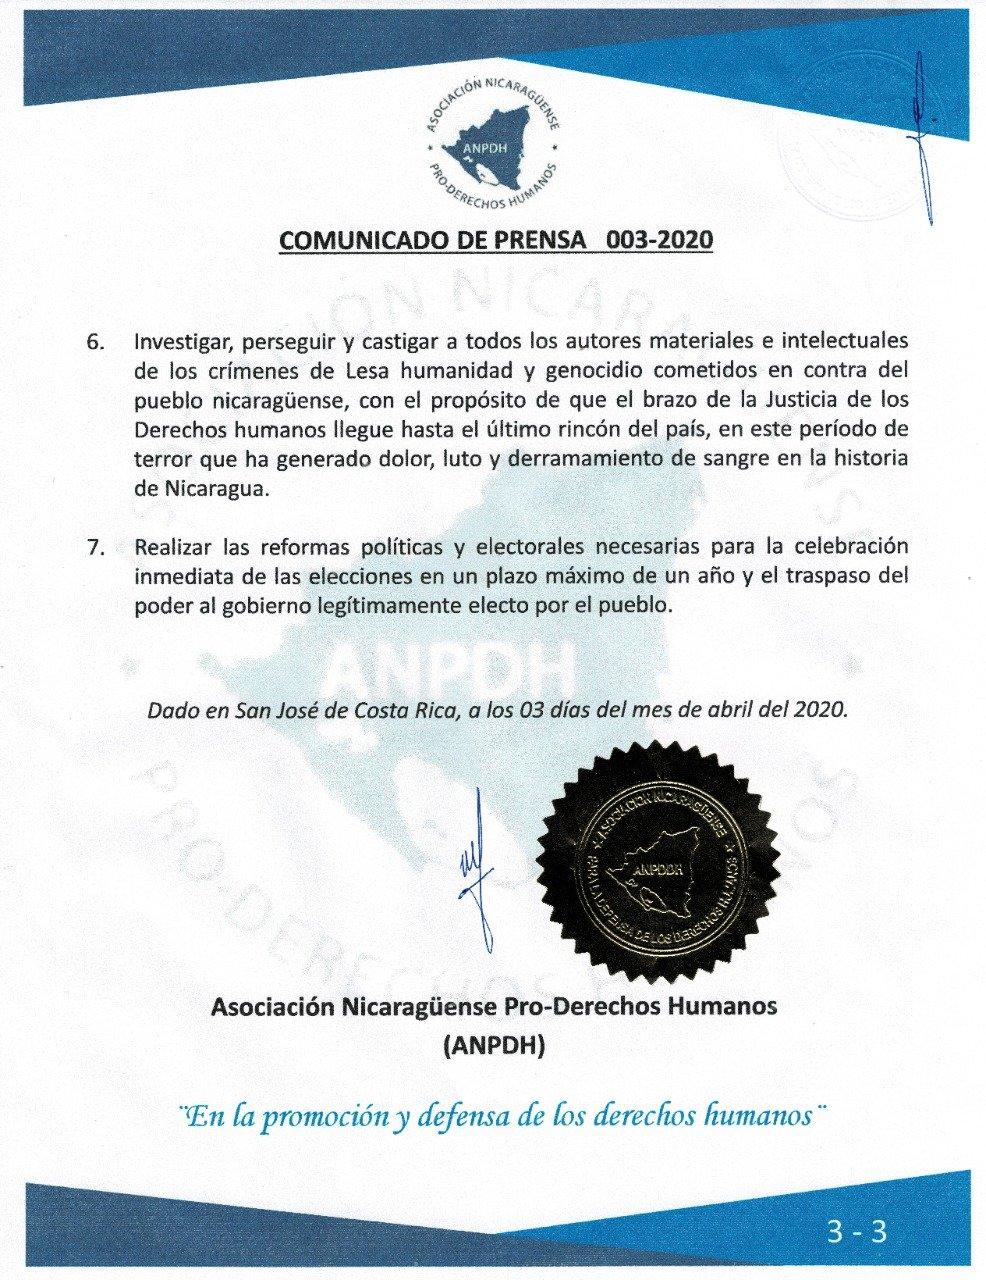 COMUNICADO-DE-PRENSA-03-2020-03.jpg